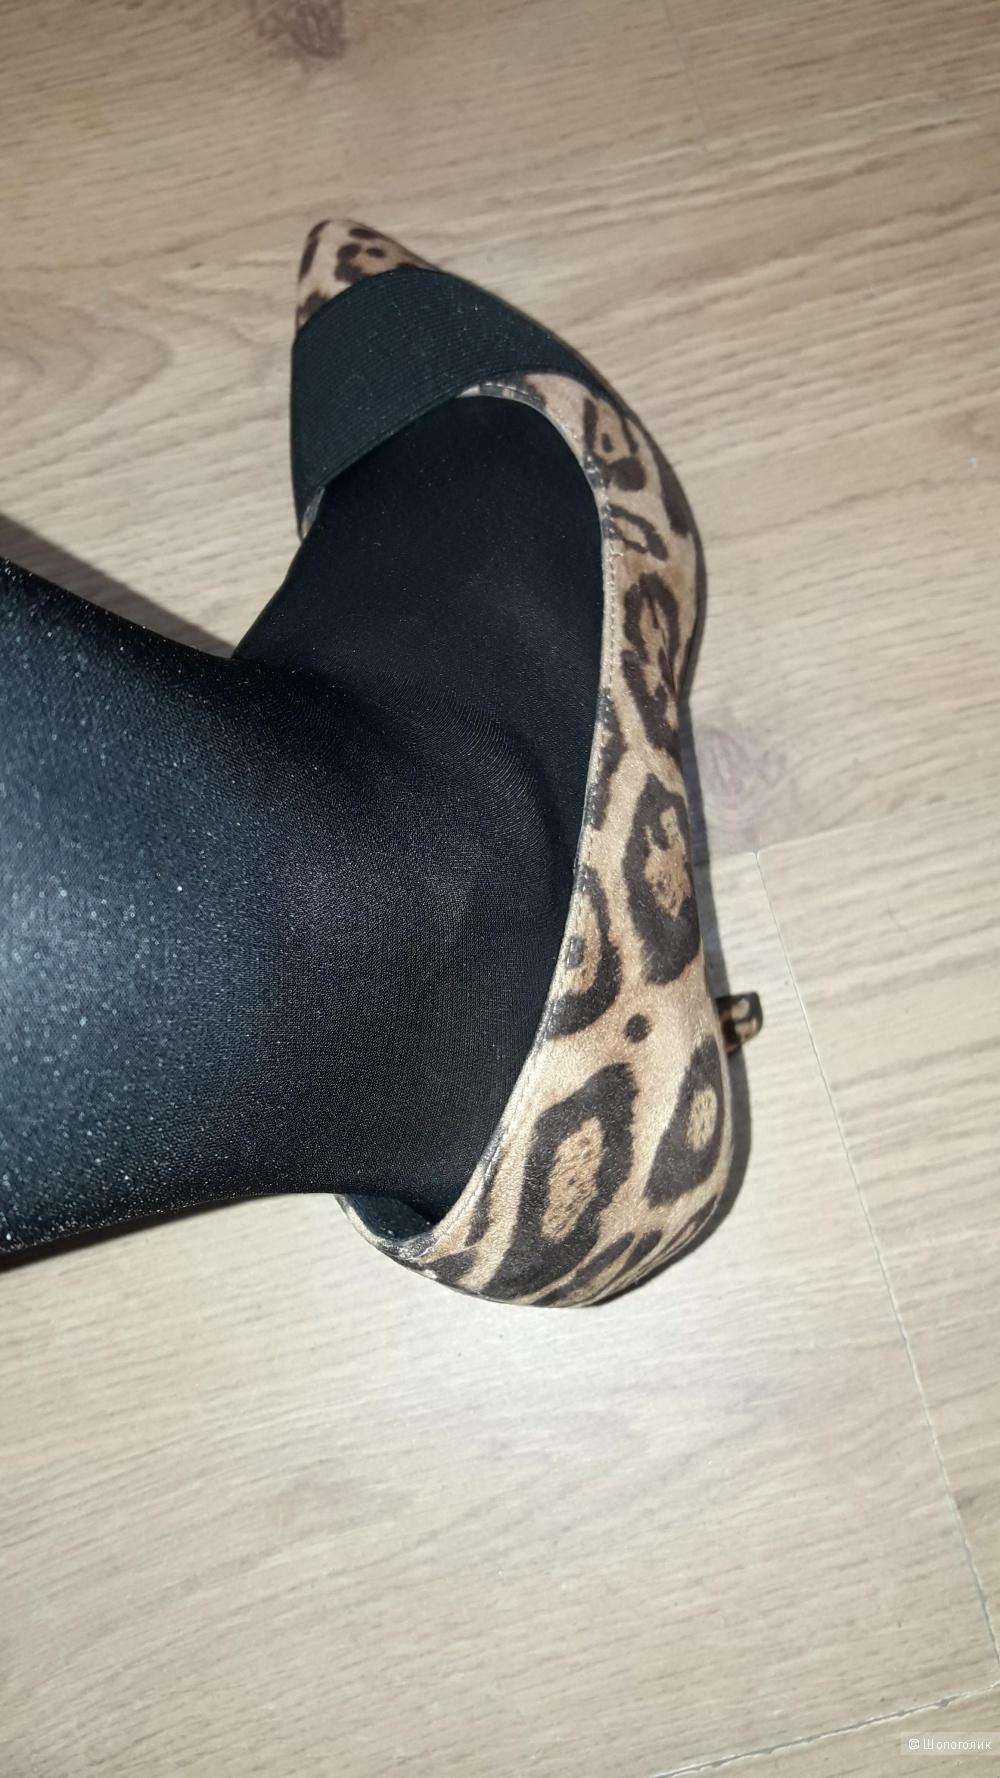 Туфли Taily Weijl 38 размера.